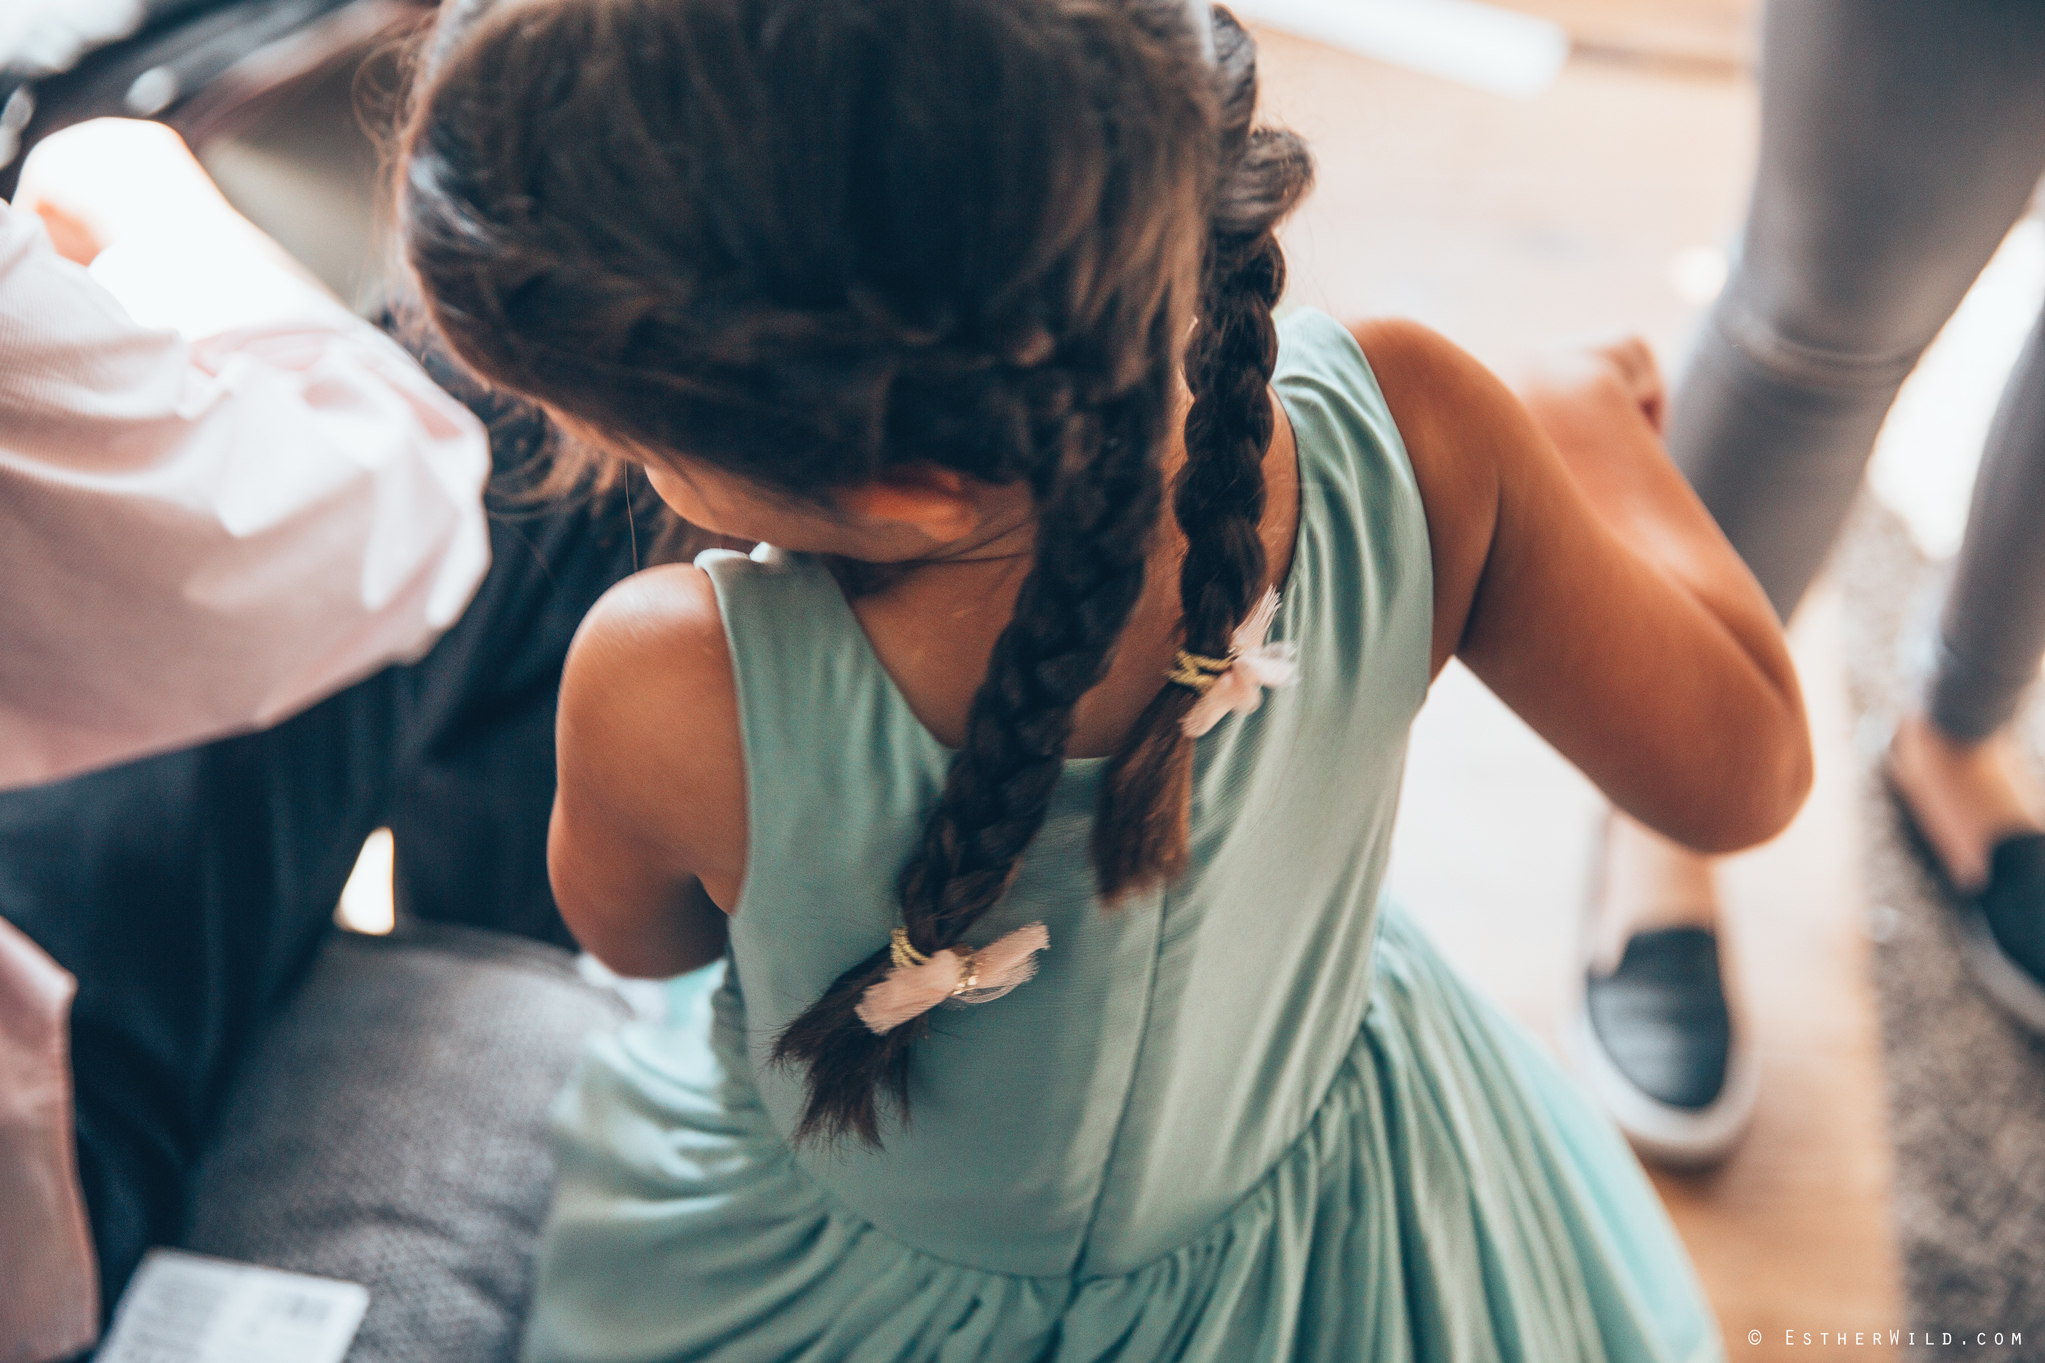 Islington_Town_Hall_Wedding_London_Photographer_Esther_Wild_IMG_4480.jpg